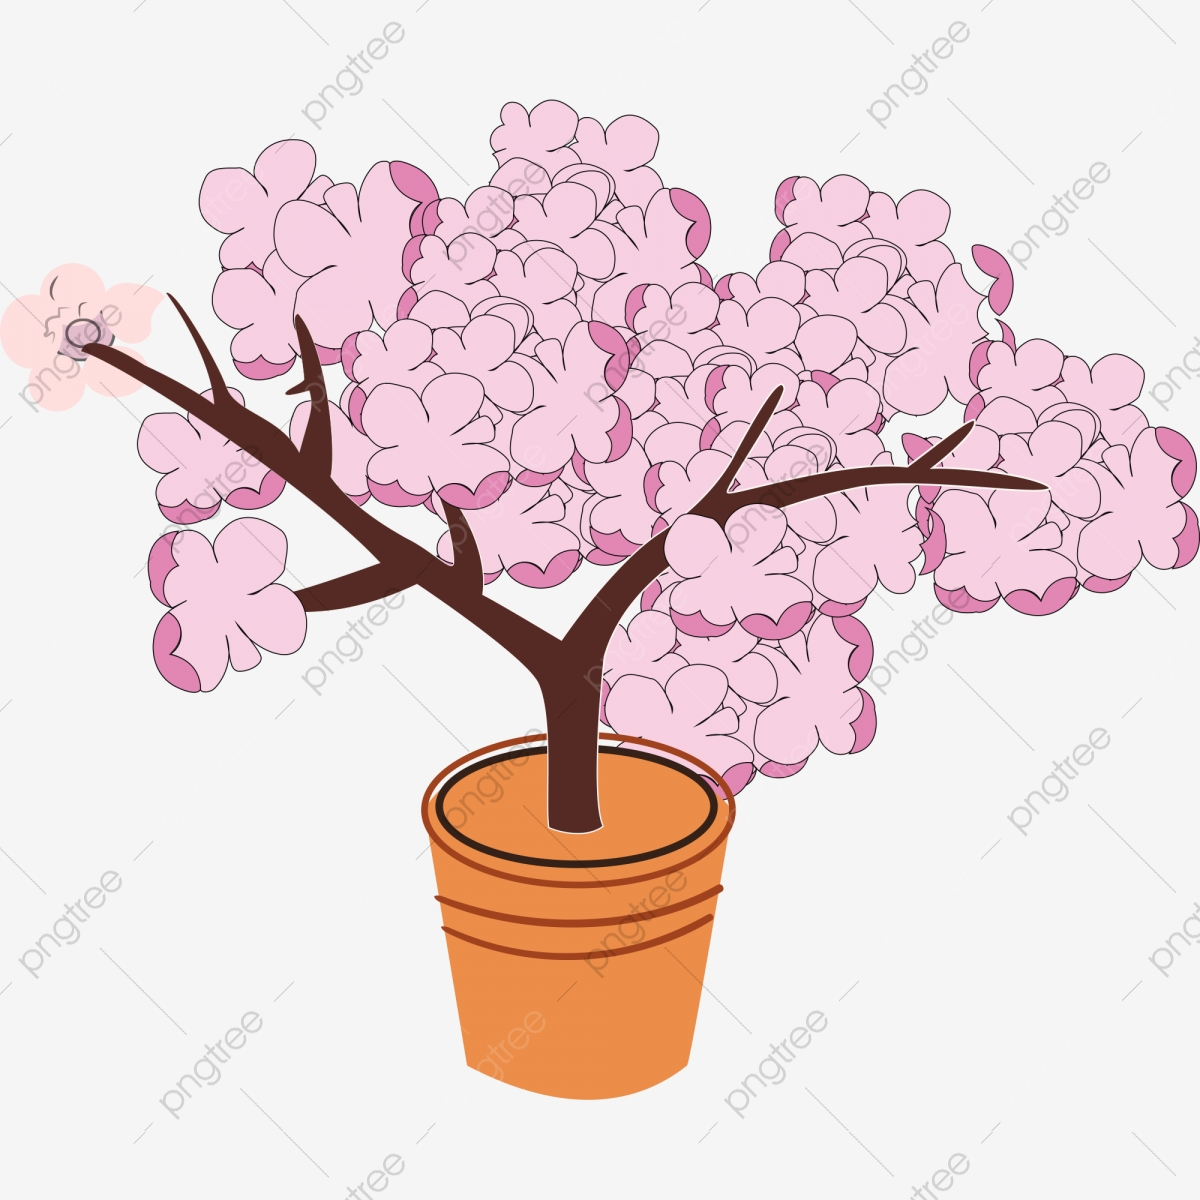 Gambar Bunga Kartun Bunga Pasu Bunga Cantik Ilustrasi Kartun Bunga Kartun Ilustrasi Kartun Bunga Pasu Png Dan Psd Untuk Muat Turun Percuma